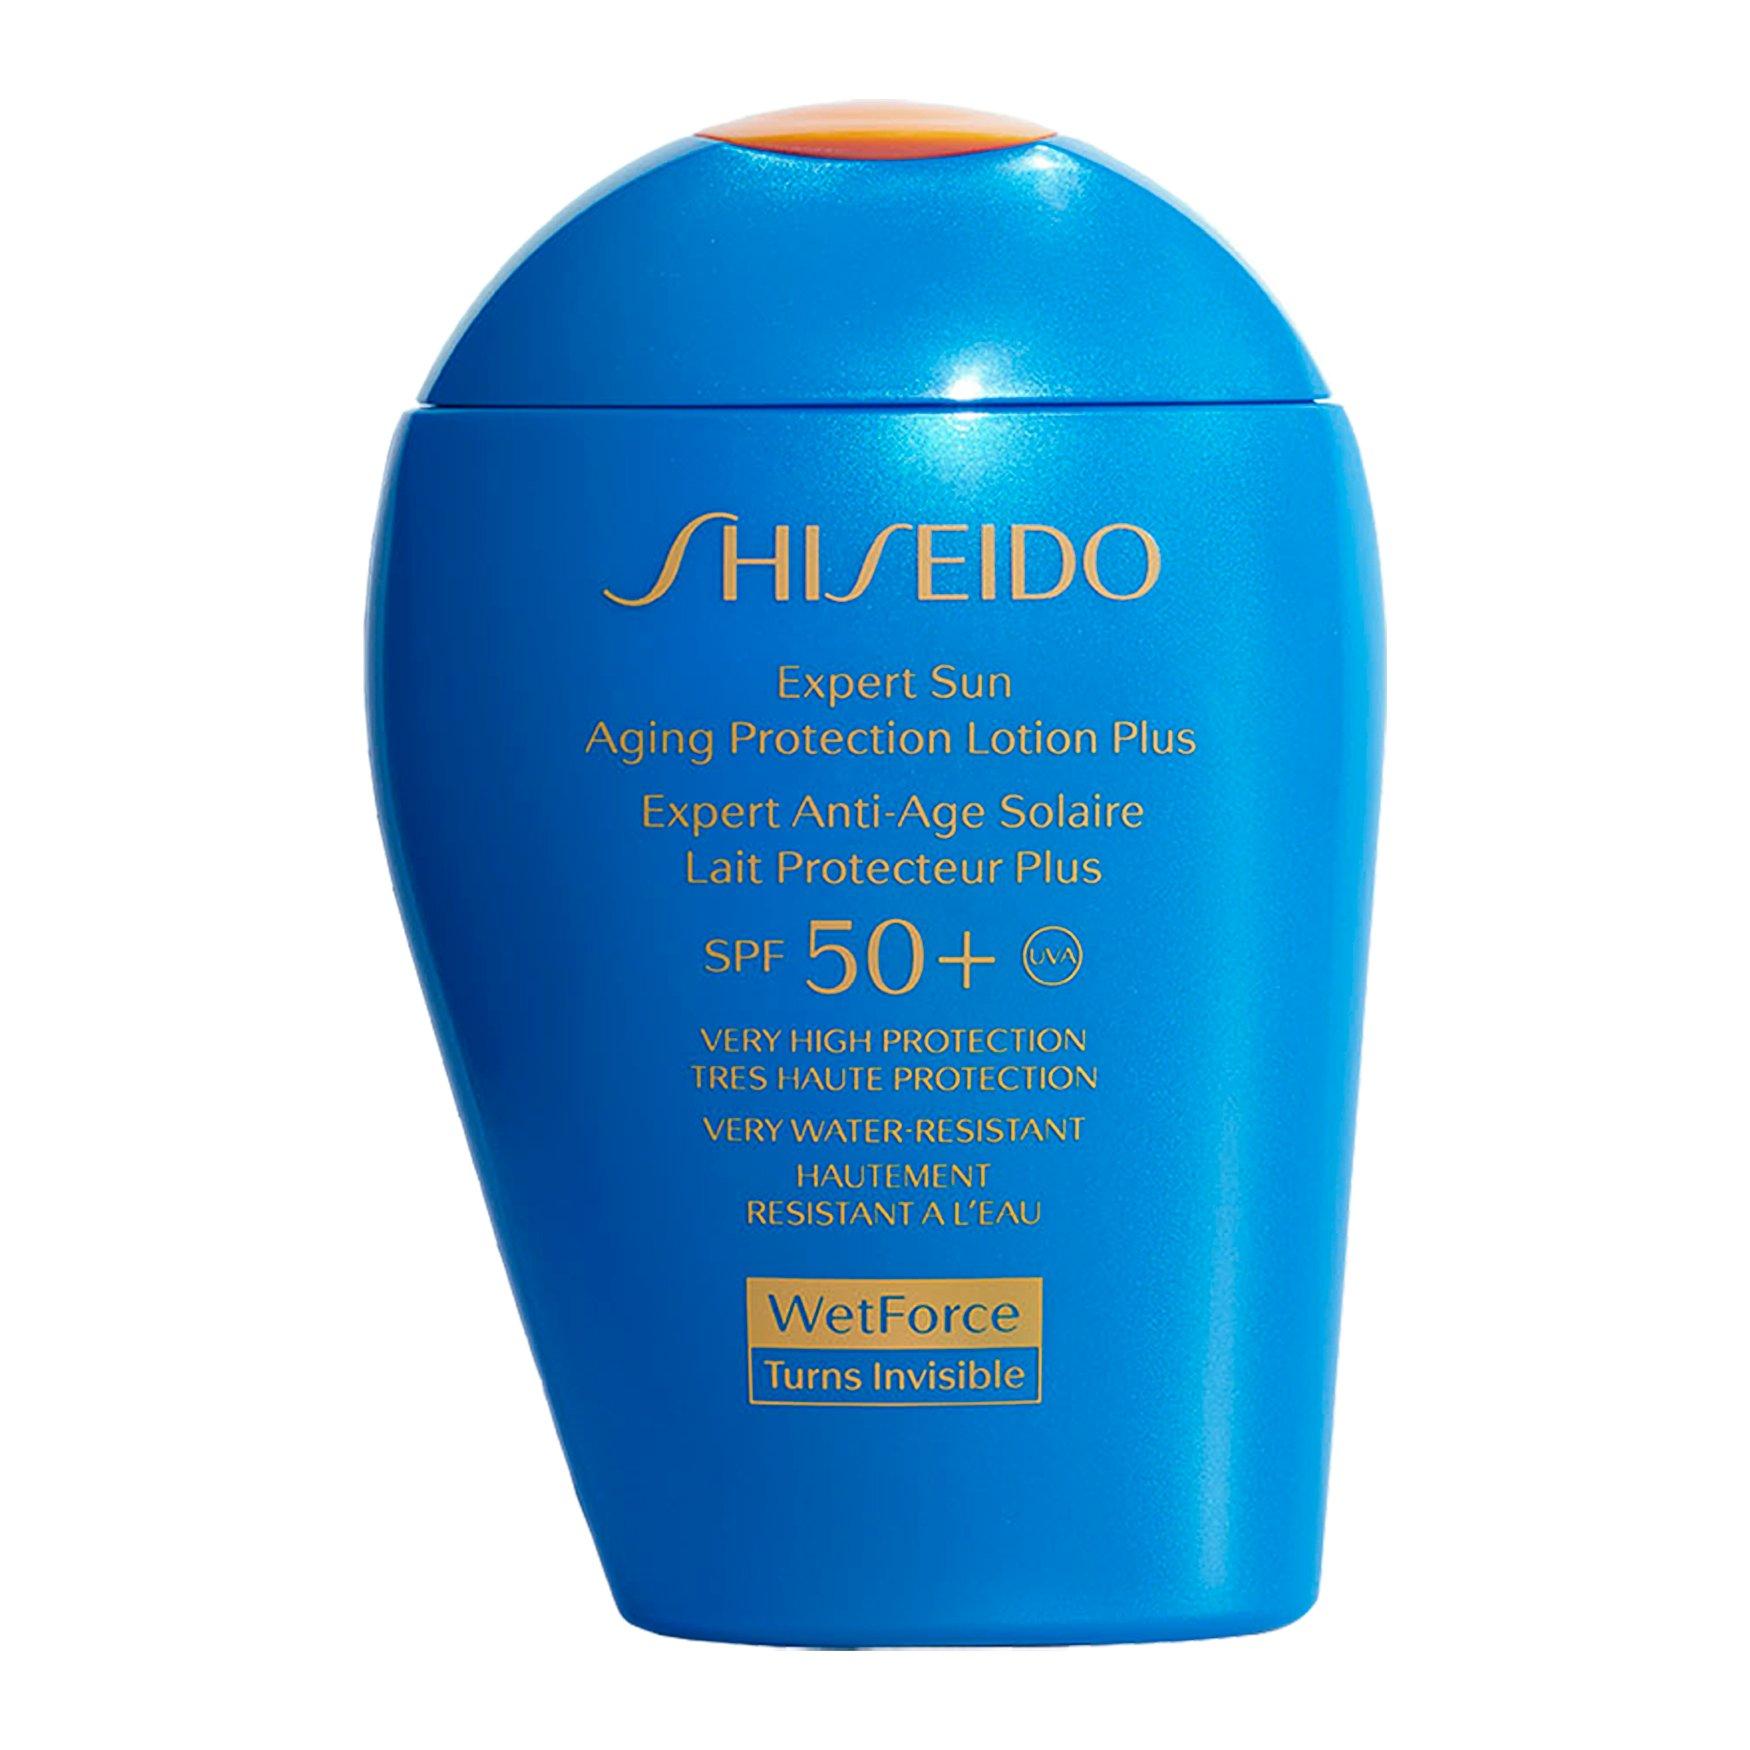 Shiseido Expert Sun Aging Protecting Lotion Plus SPF50+++++